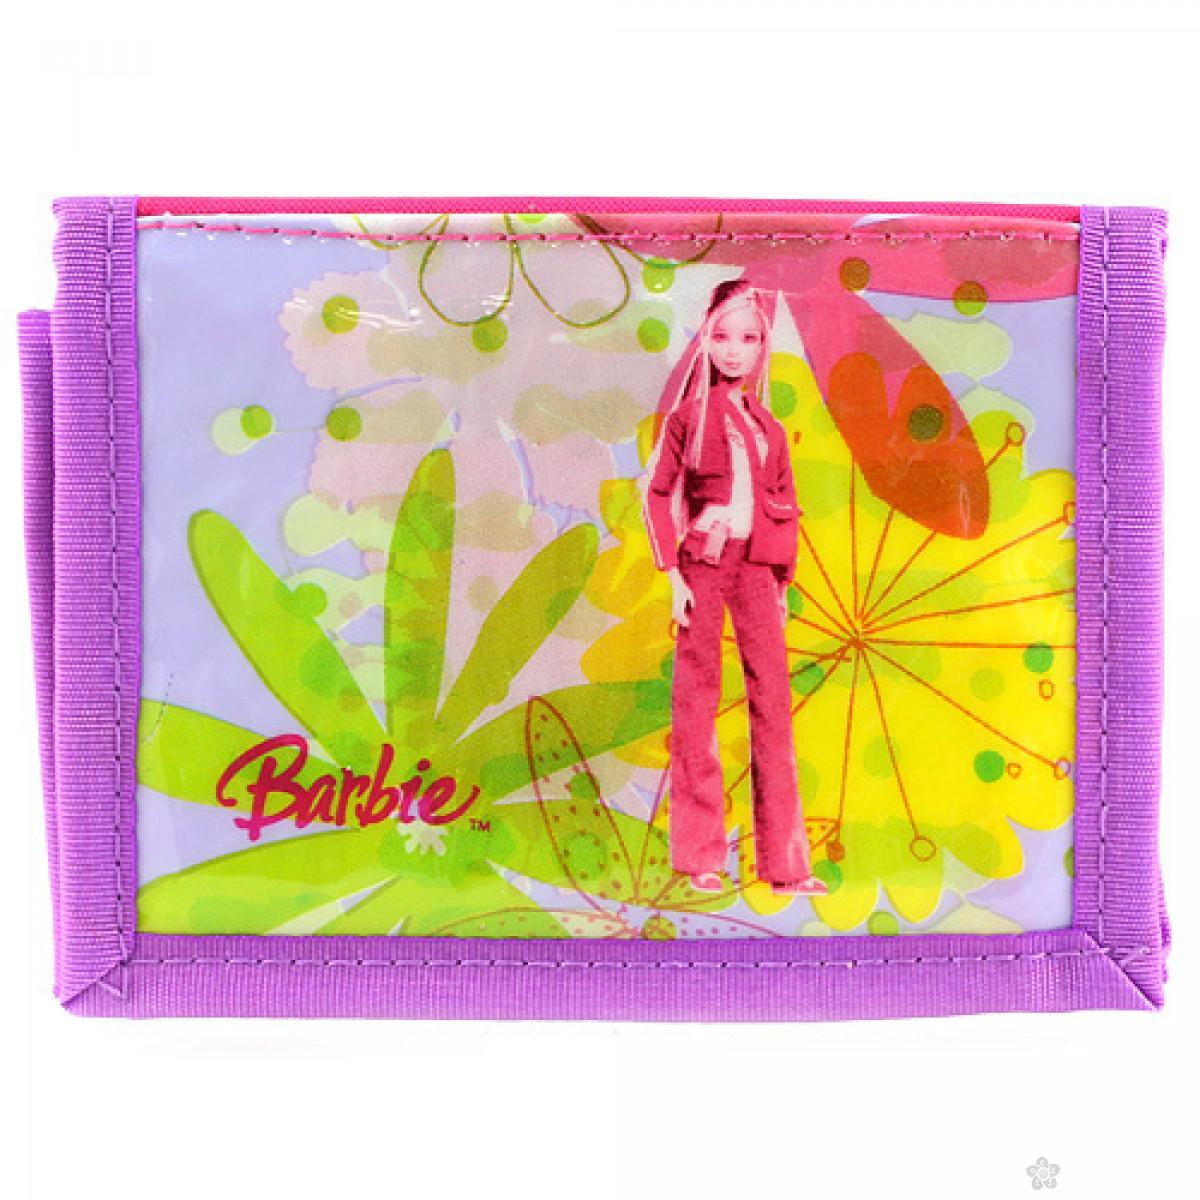 Novčanik Barbie Target, 14390